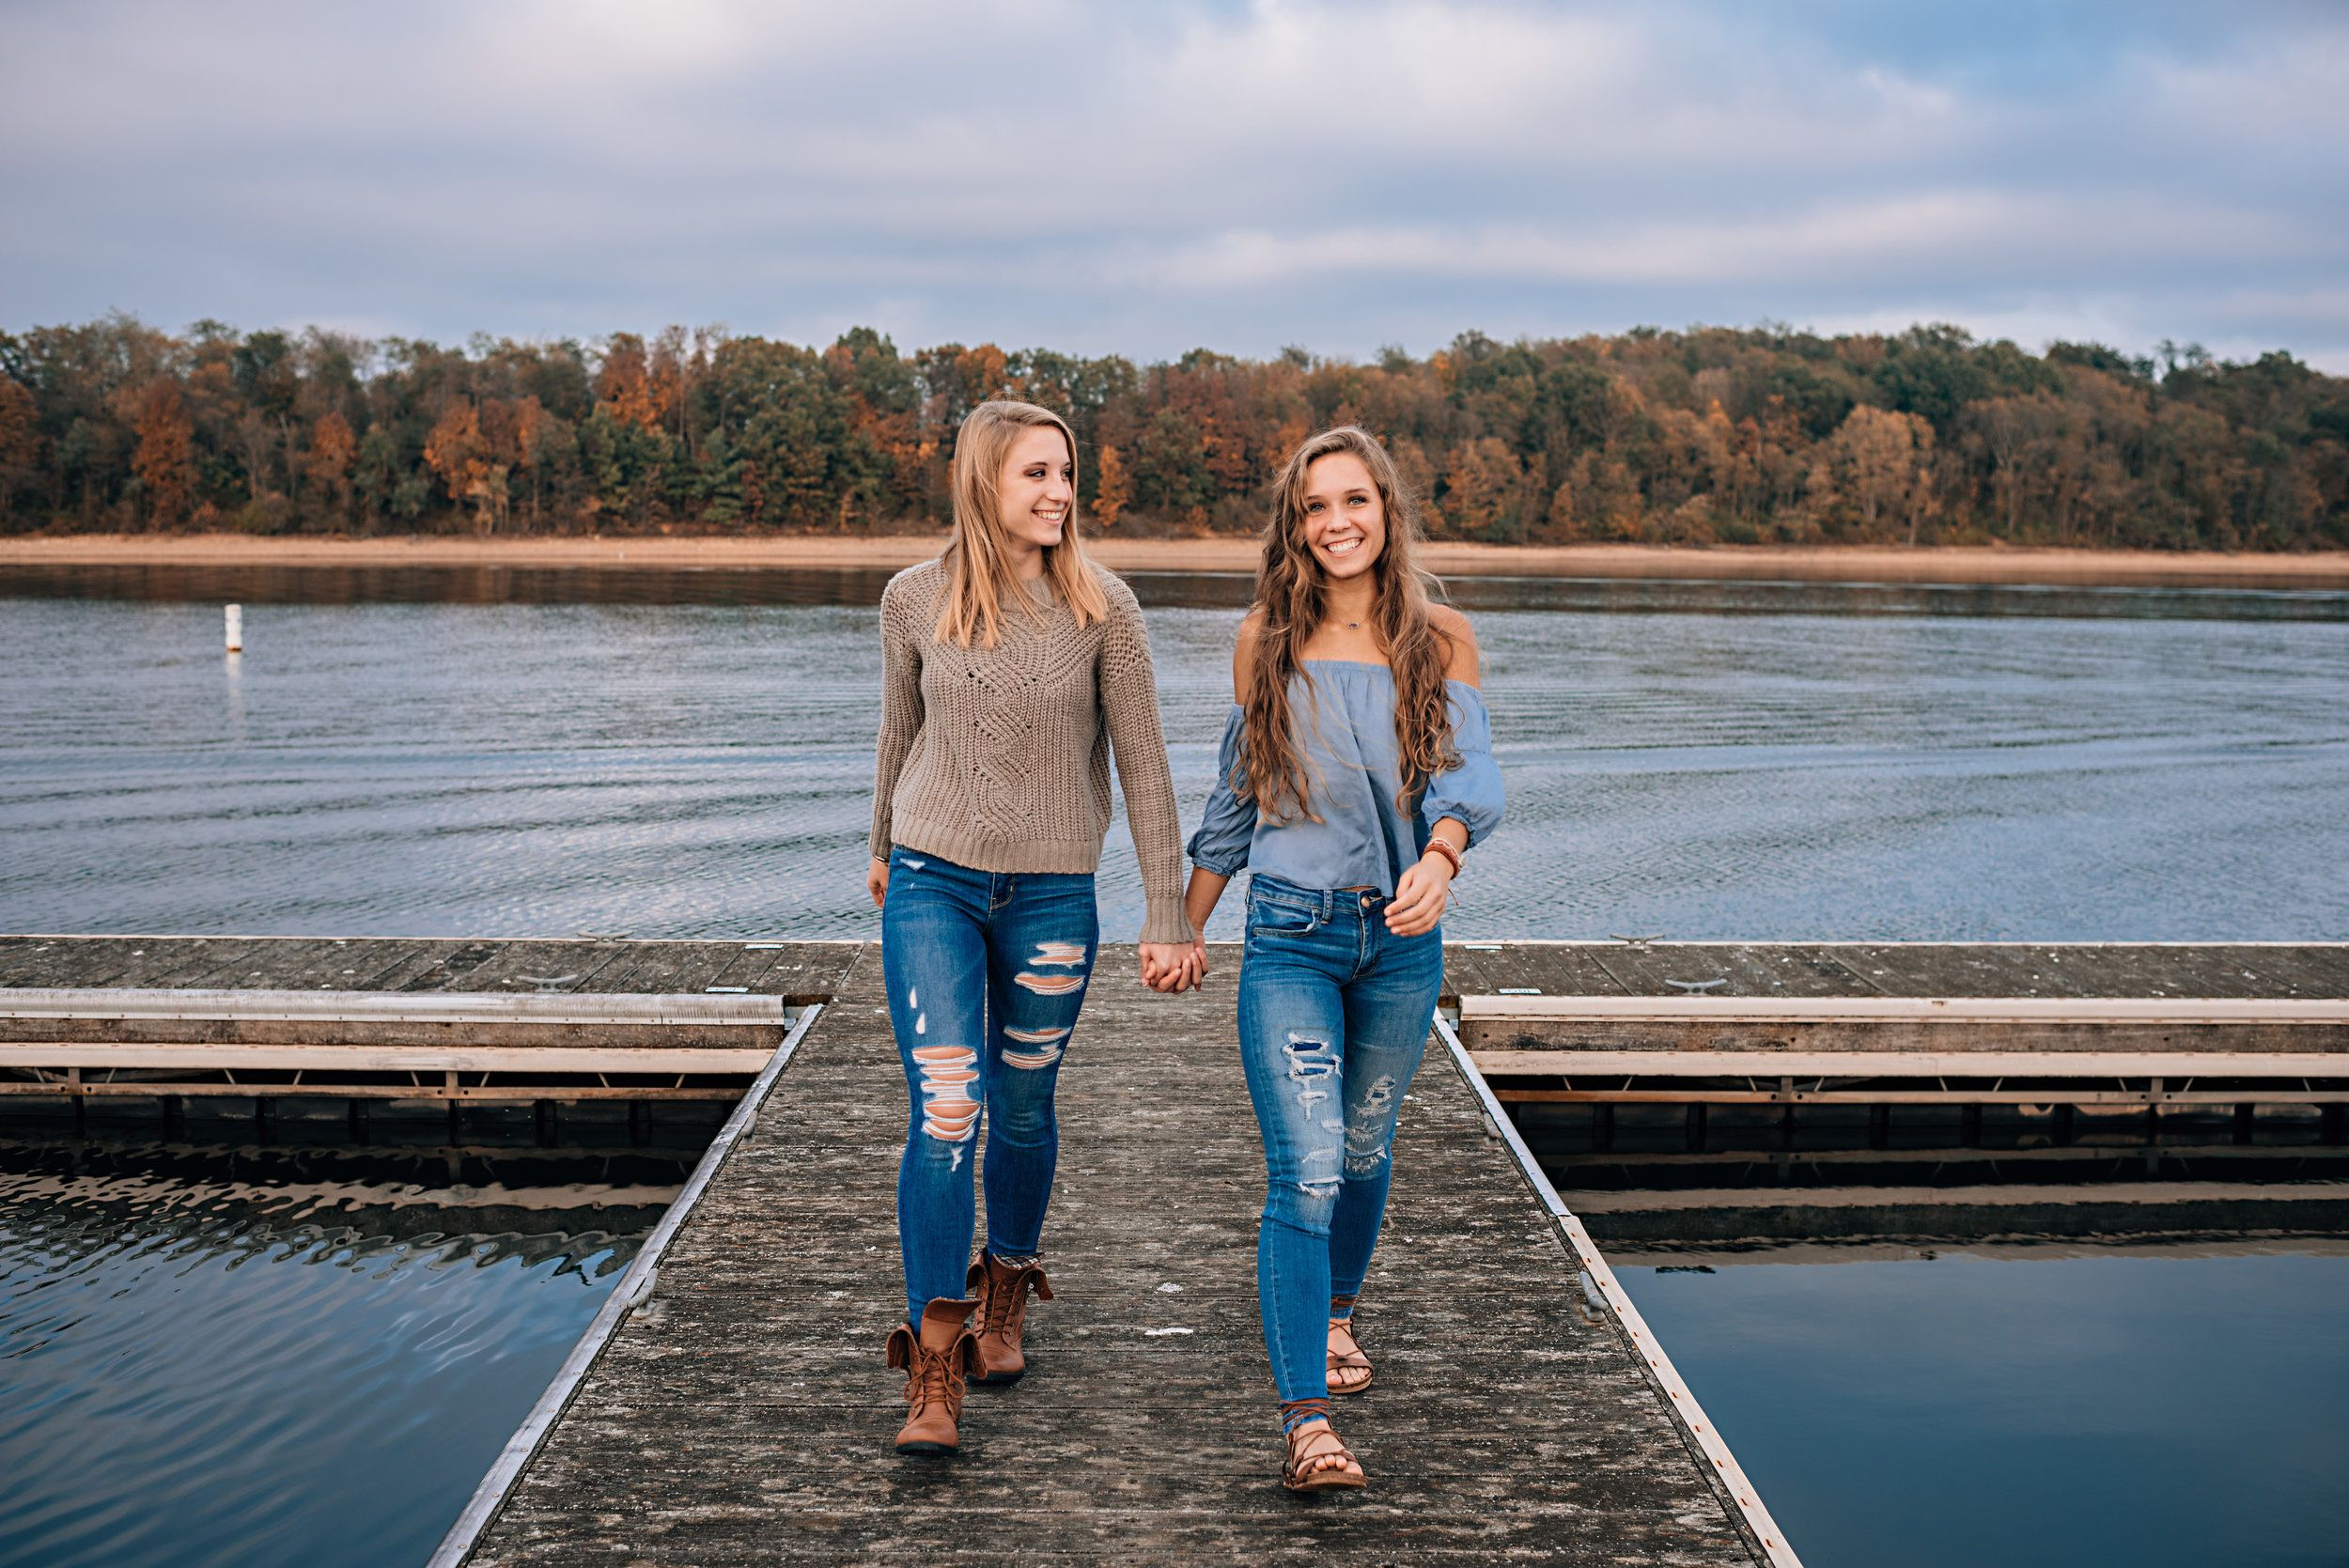 Allie And Sam Z South Carroll Class Of 2018 Fall Senior Portraits Senior Portraits Sisters Photoshoot